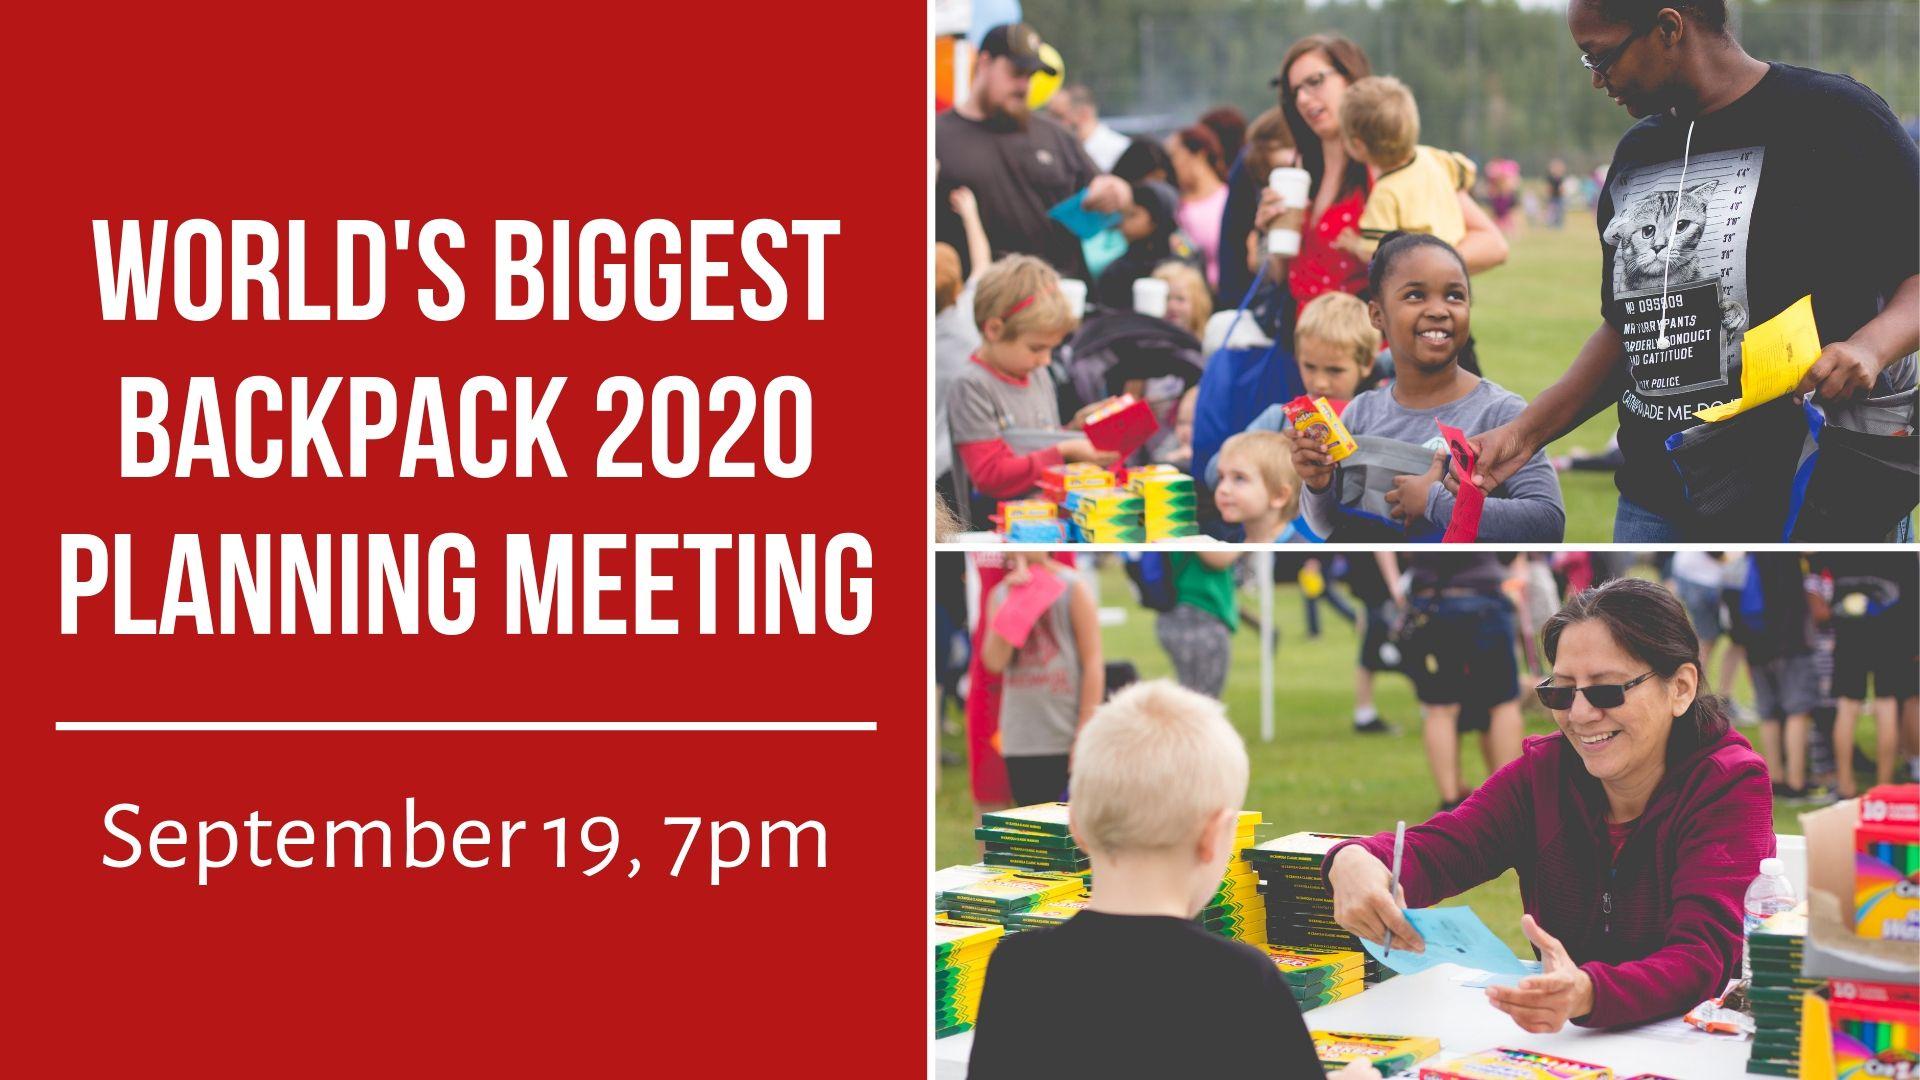 World's Biggest Backpack Planning Meeting.jpg